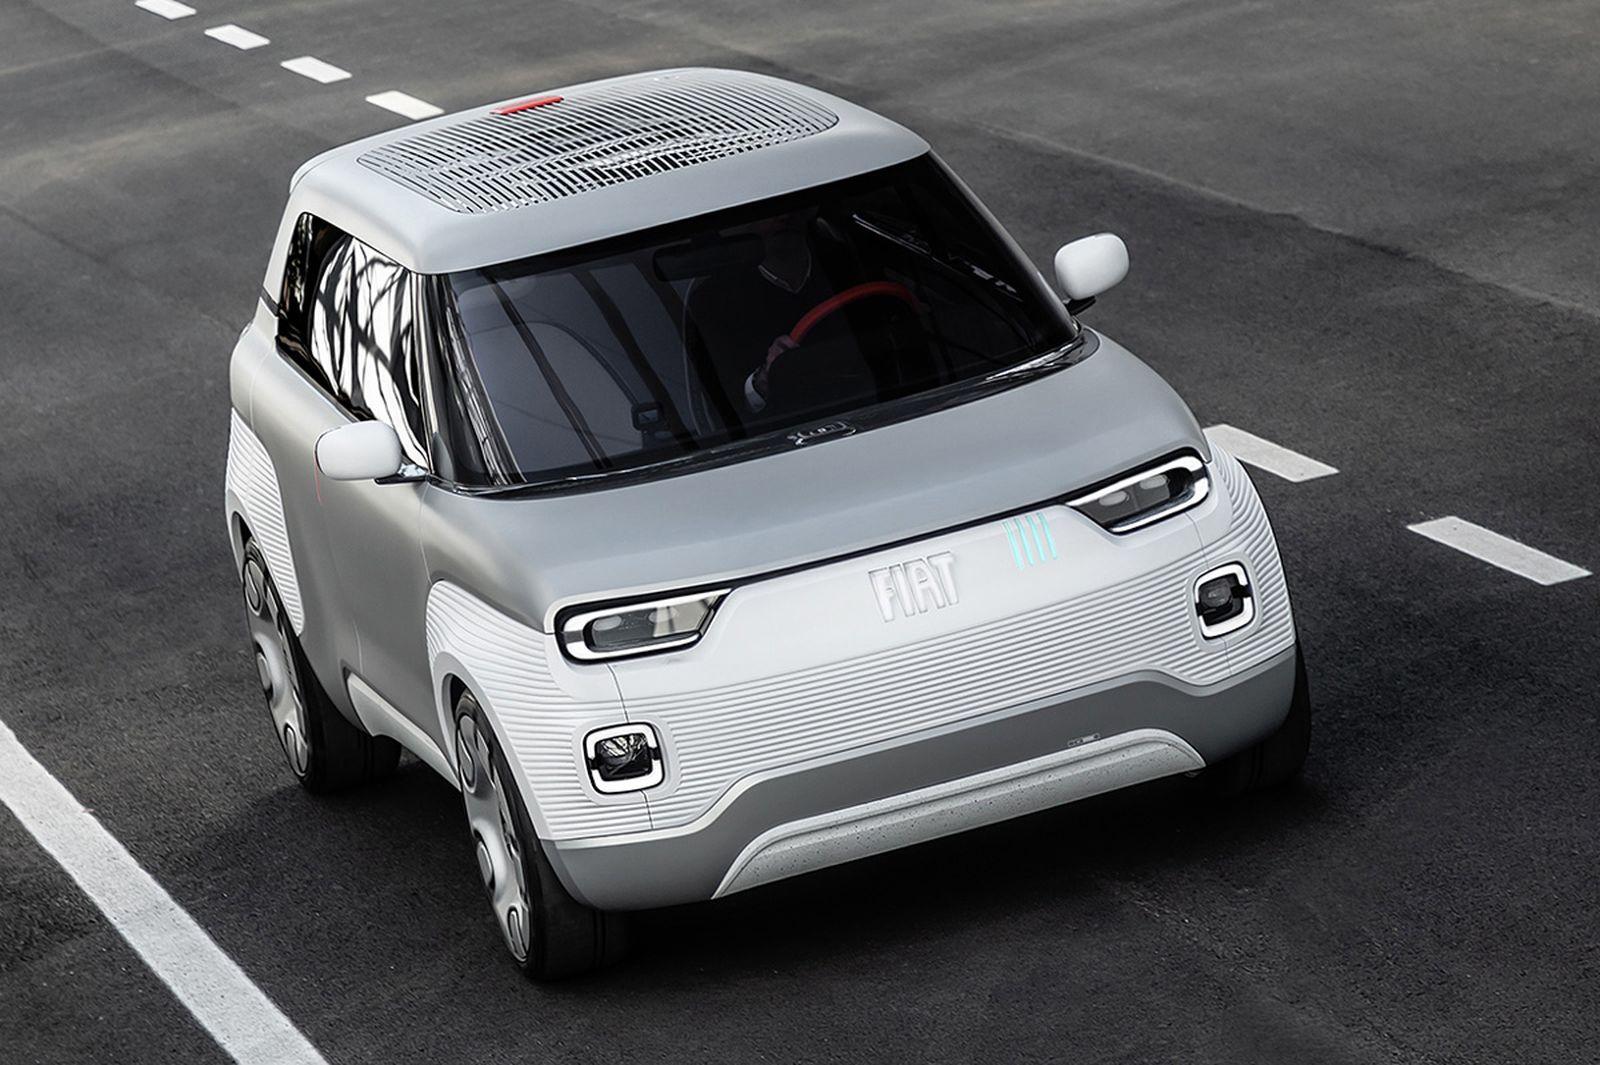 ces-2020-electric-cars-Fiat